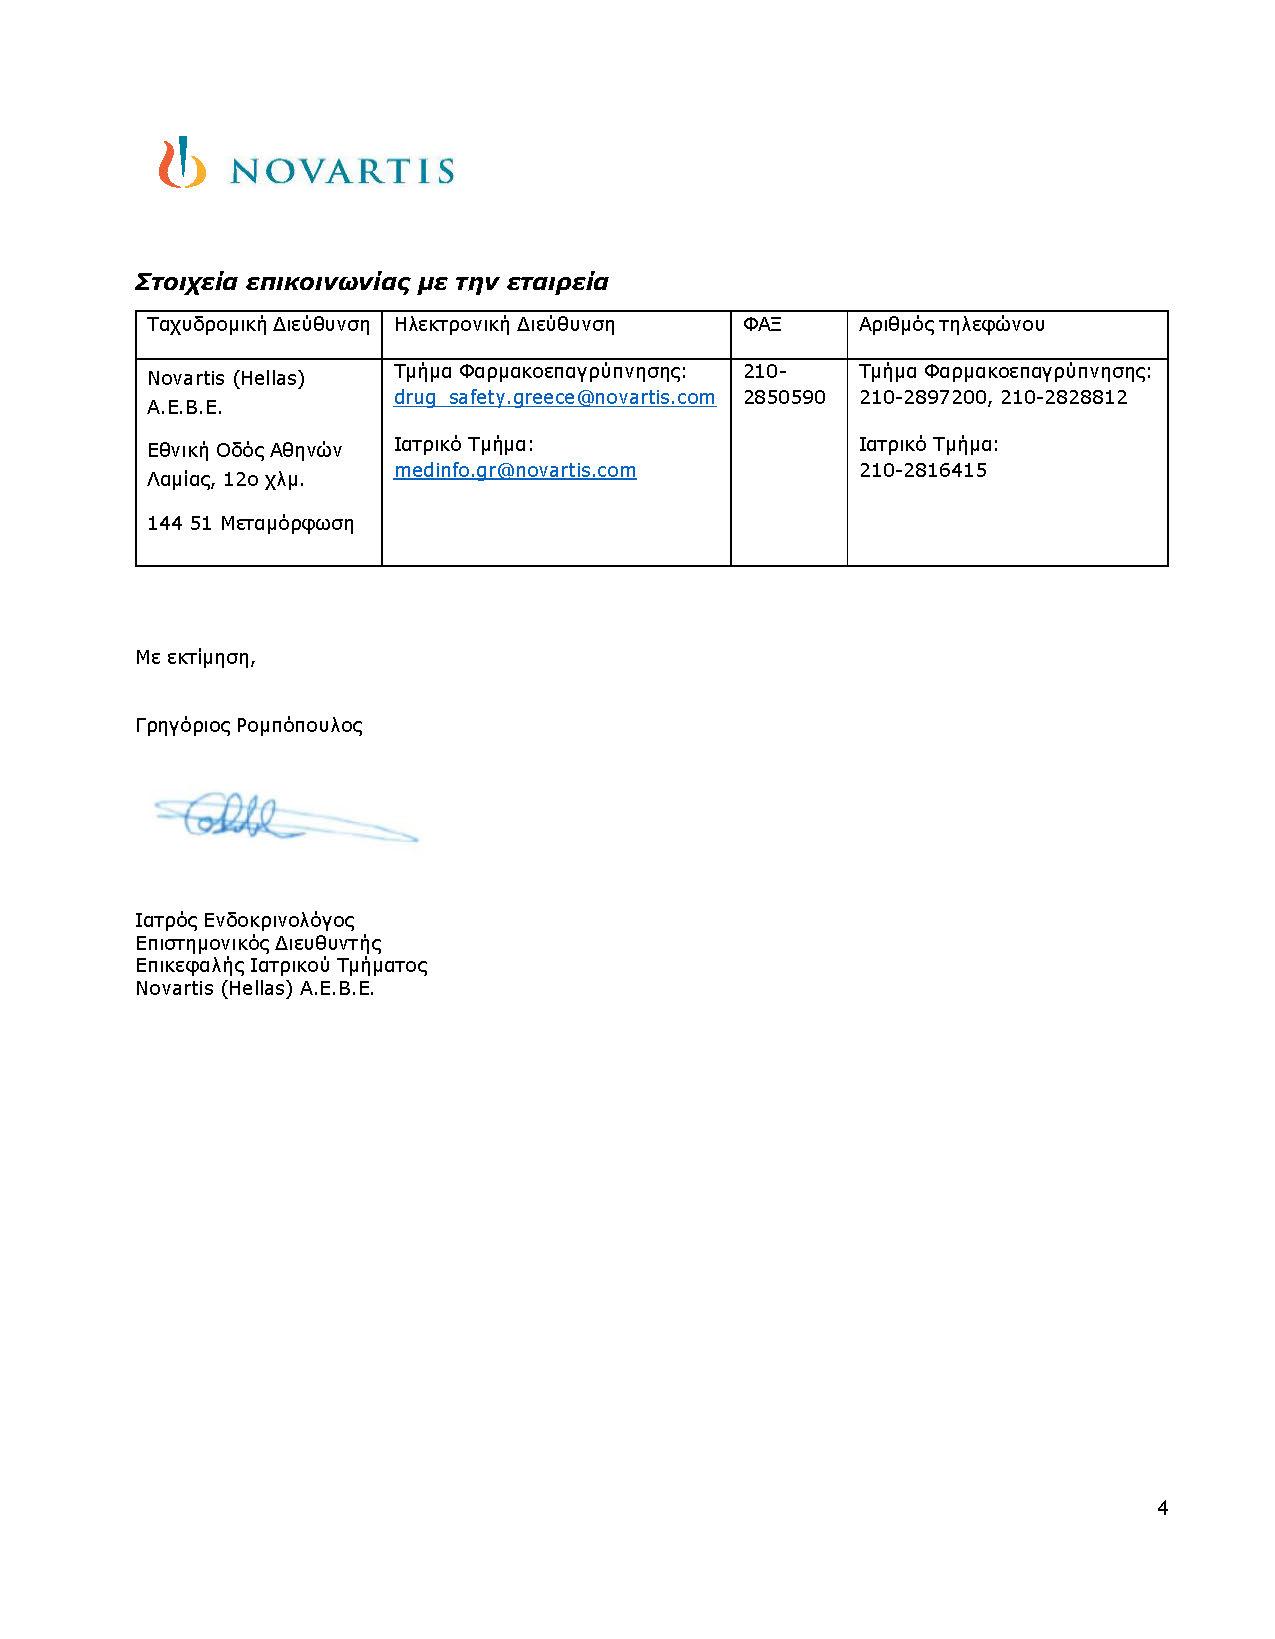 Gilenya II-53 -DHPC letter_02Sep19_final (002)_Page_4